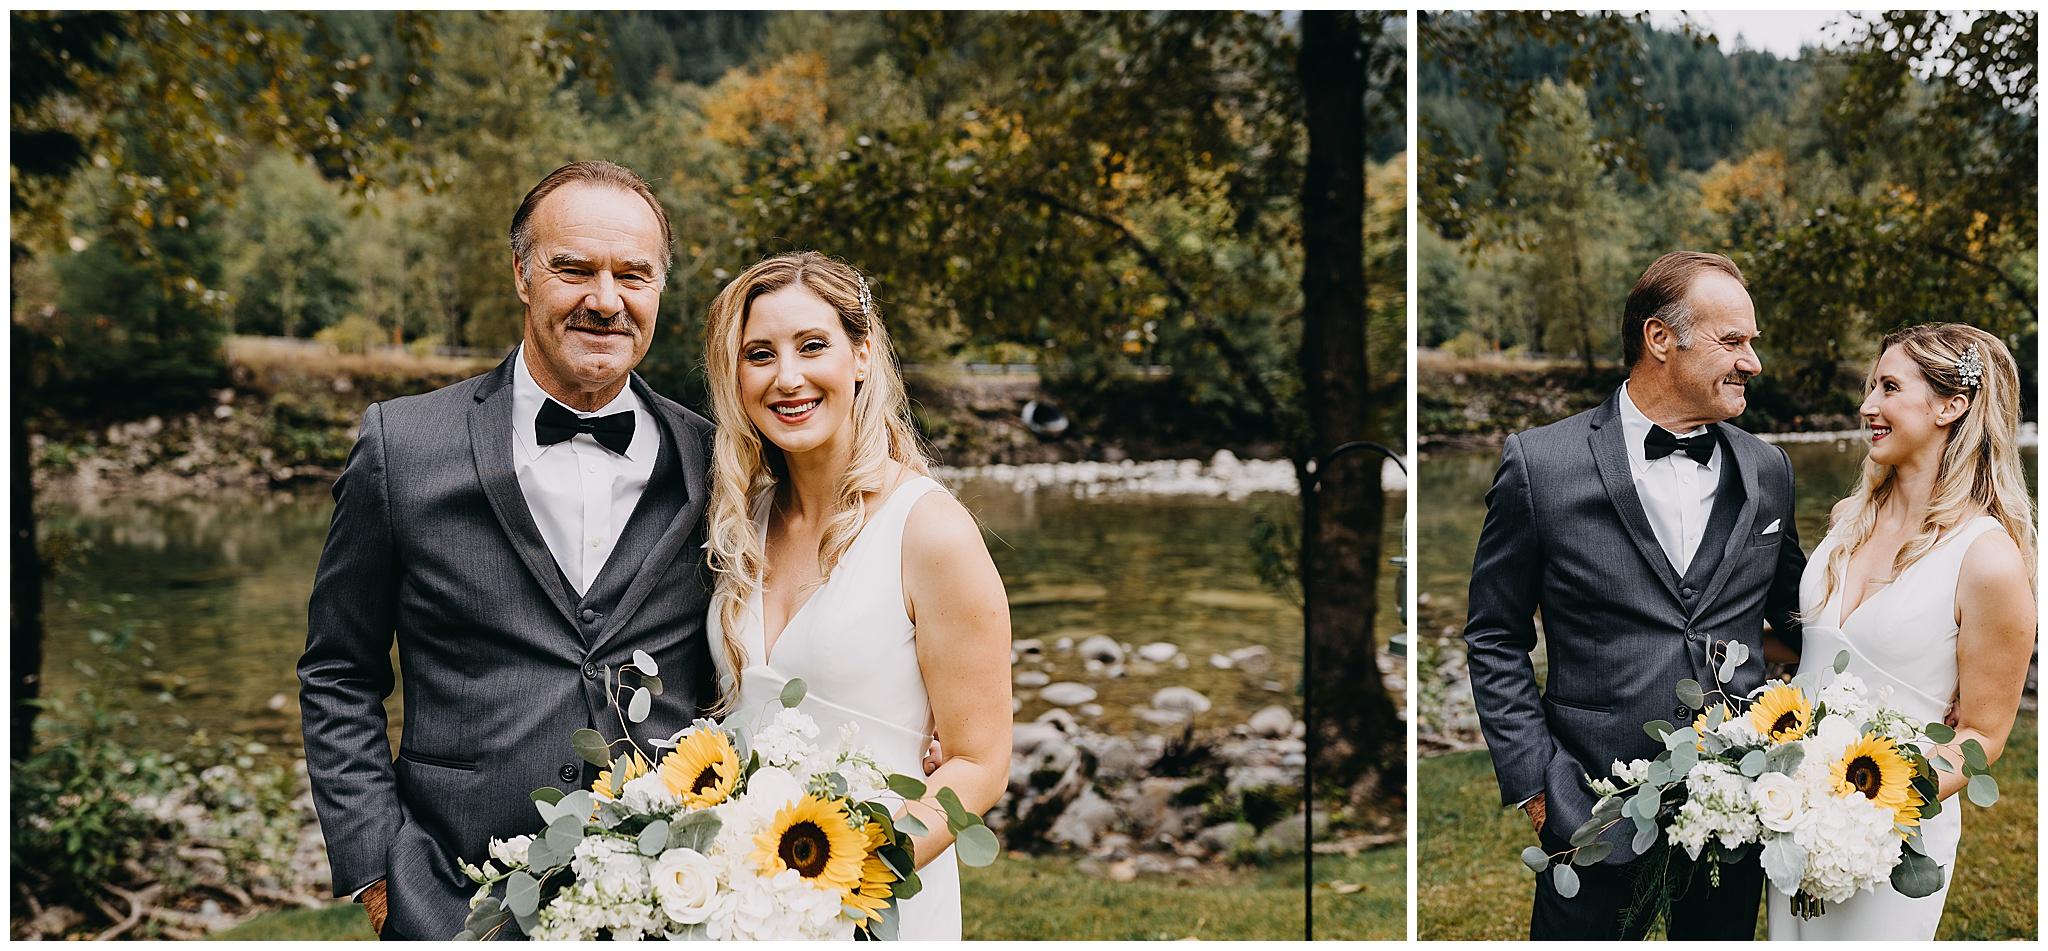 index-wa-wedding36.jpg